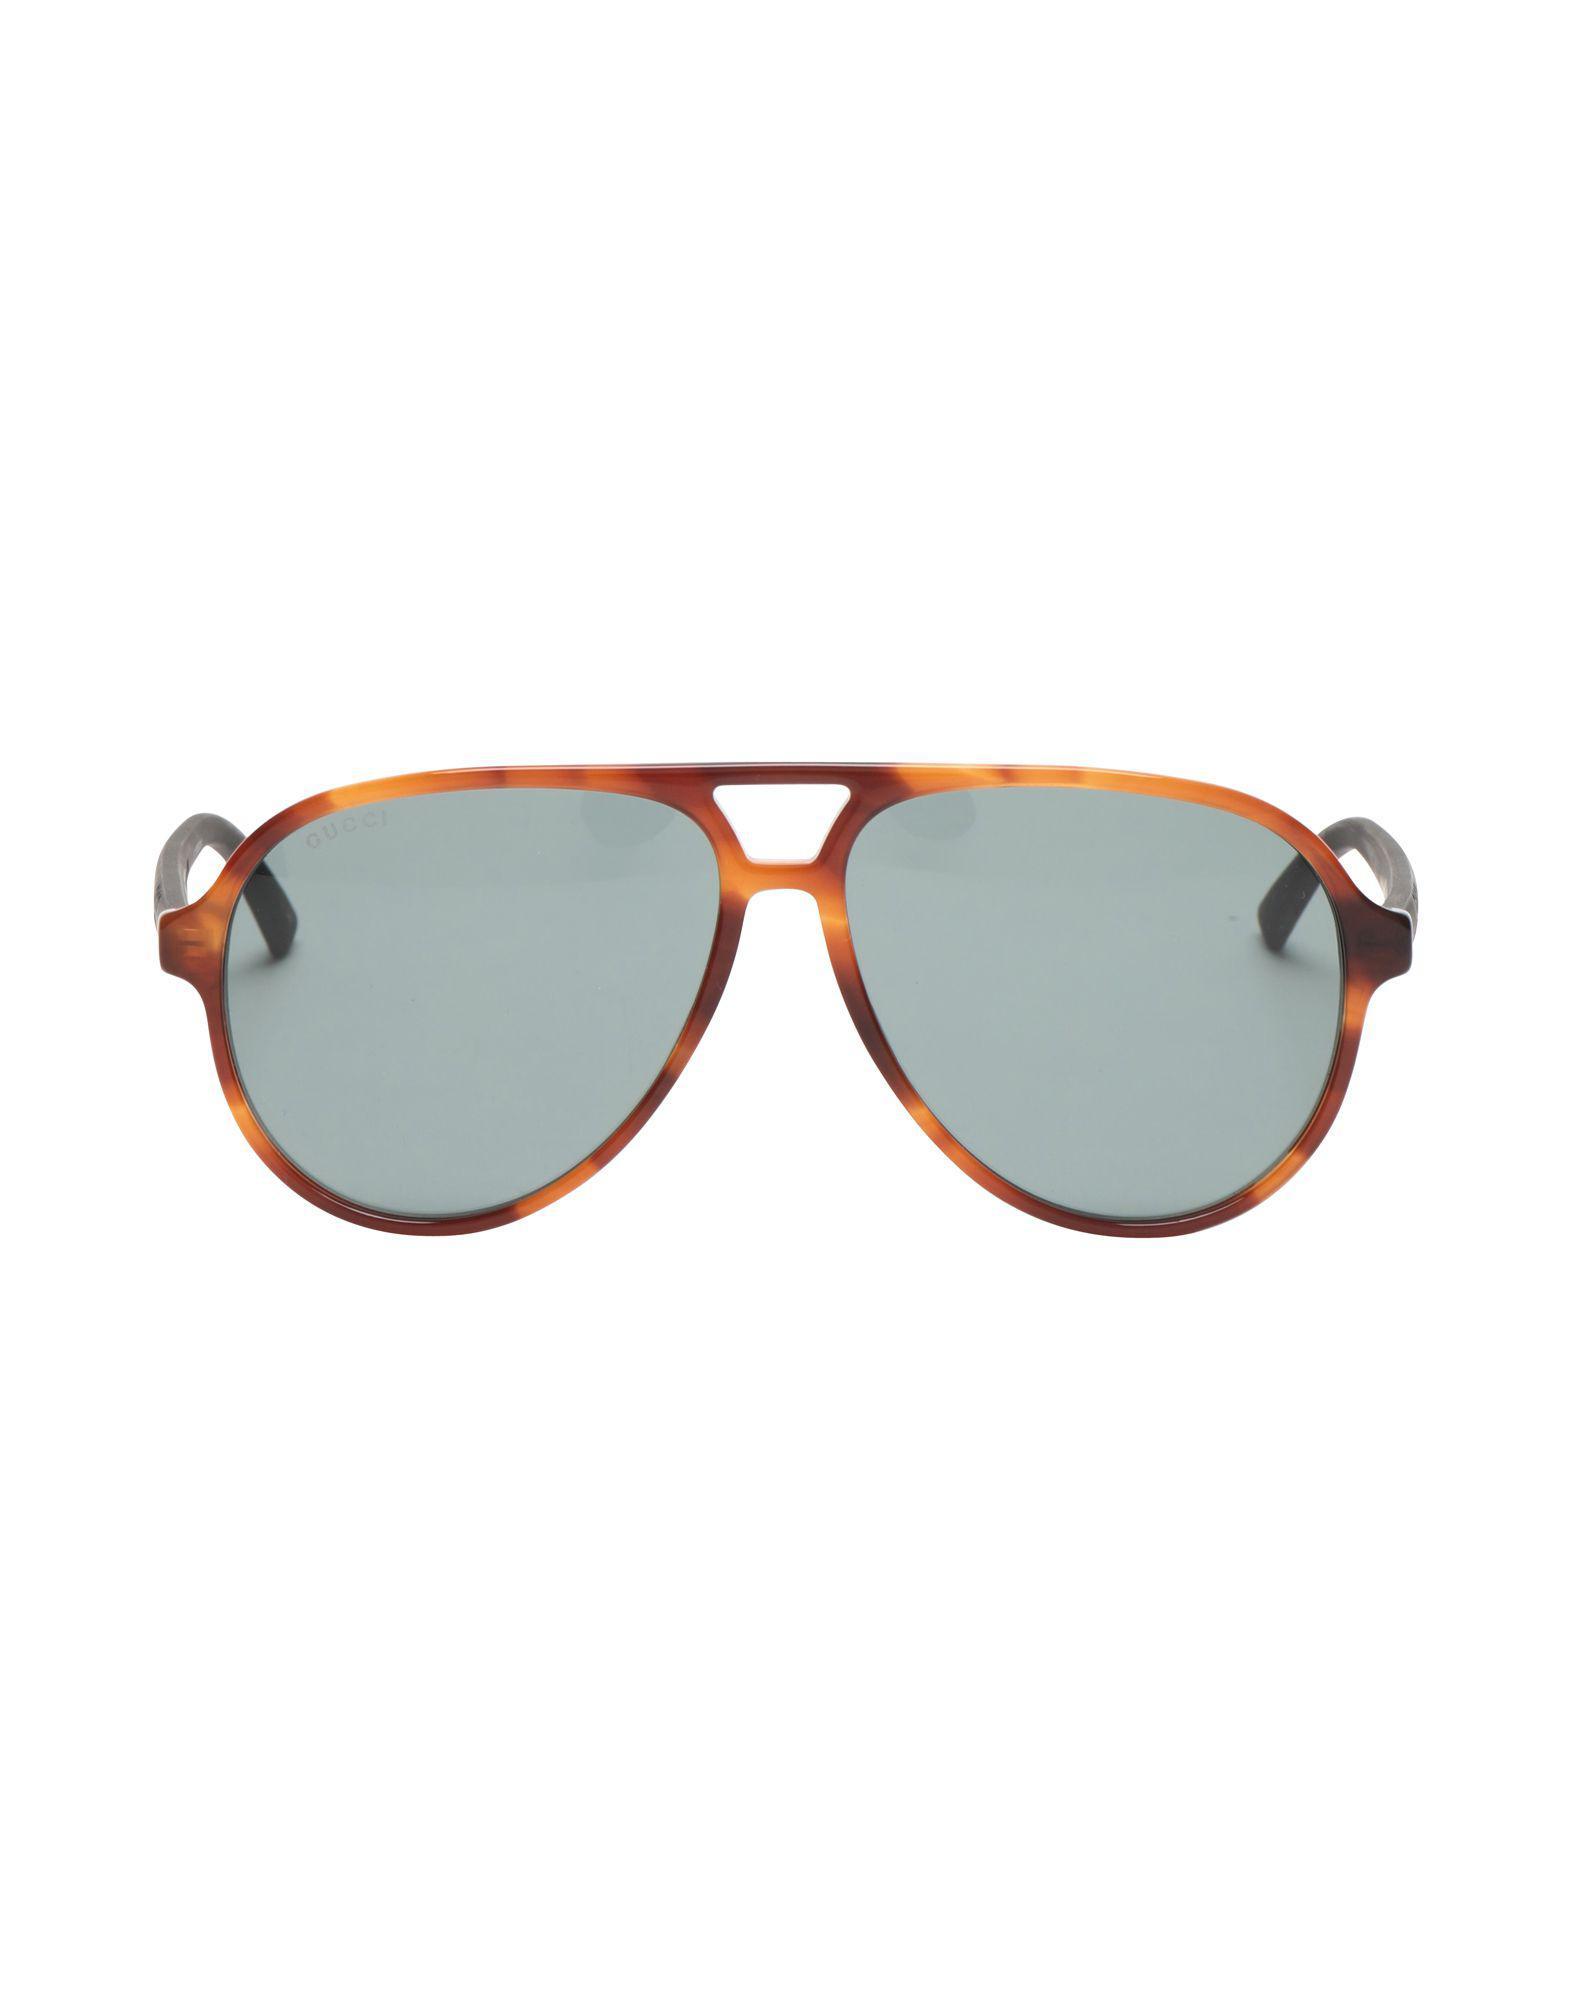 4b98abb4158 Gucci Sunglasses in Brown for Men - Lyst